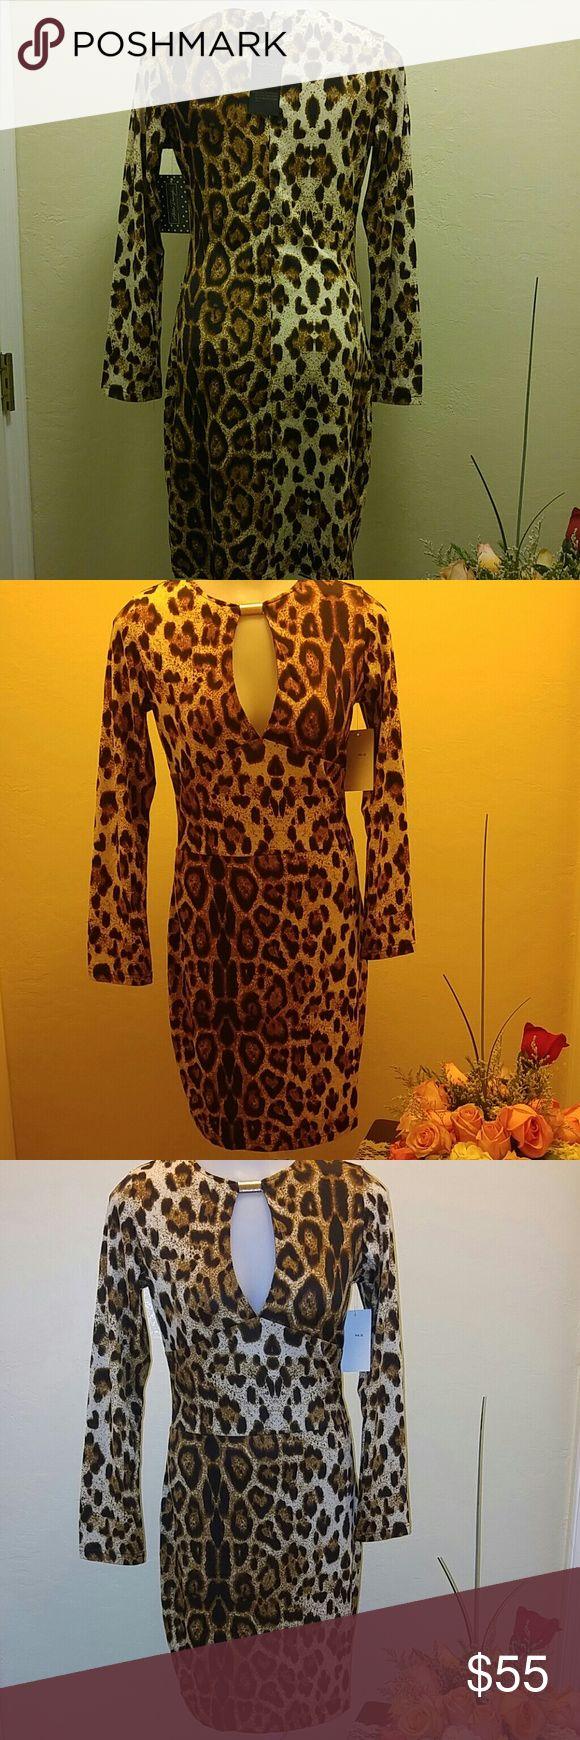 Tiger print dress Cute fashionable simple long sleeve tiger print dress .From the kim Kardashian line. shez Dresses Long Sleeve